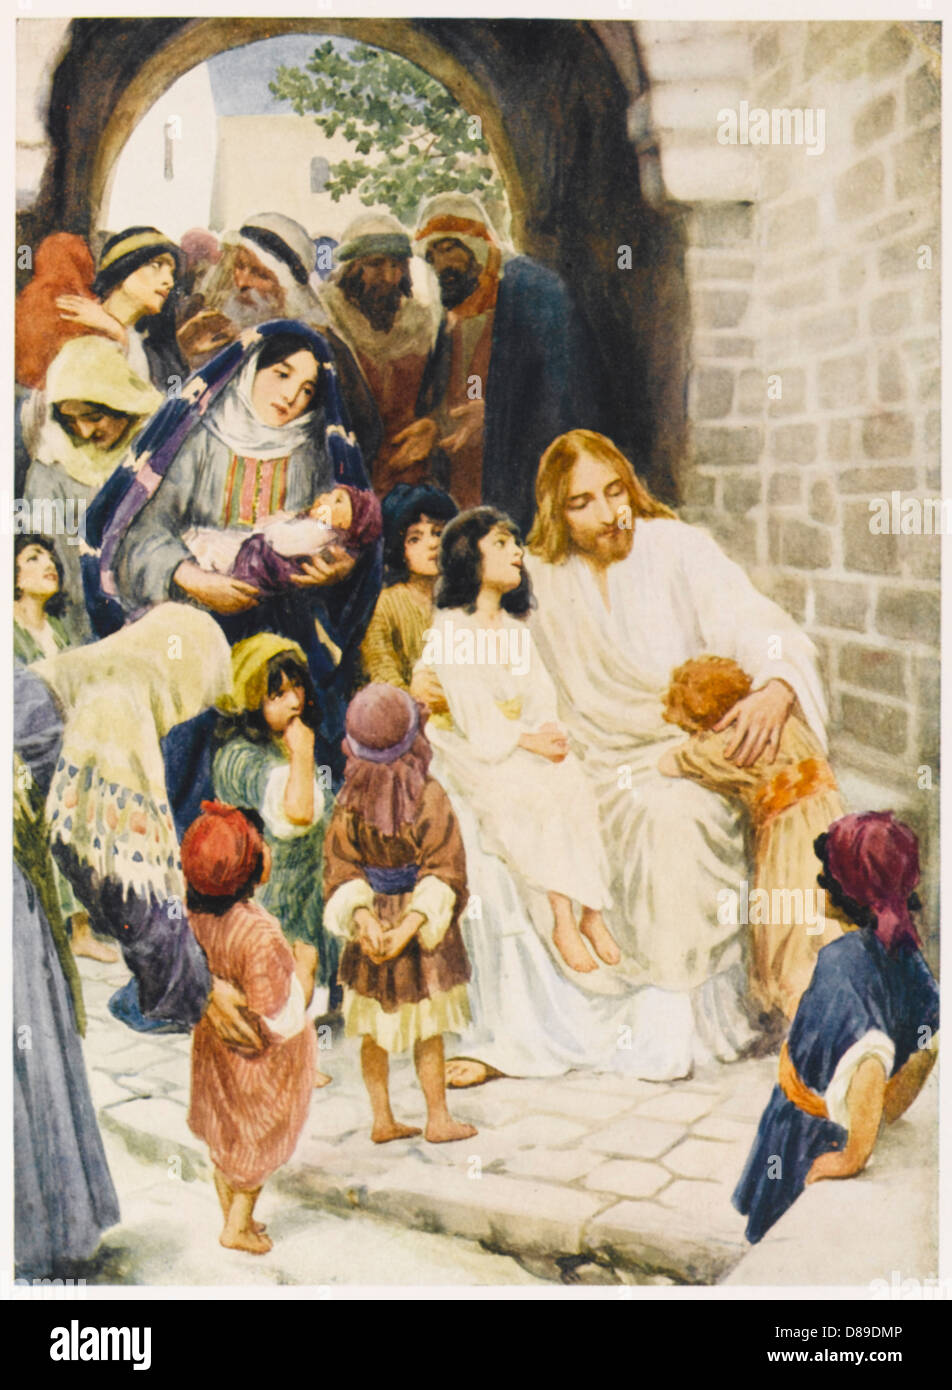 jesus and children stock photo royalty free image 56756694 alamy